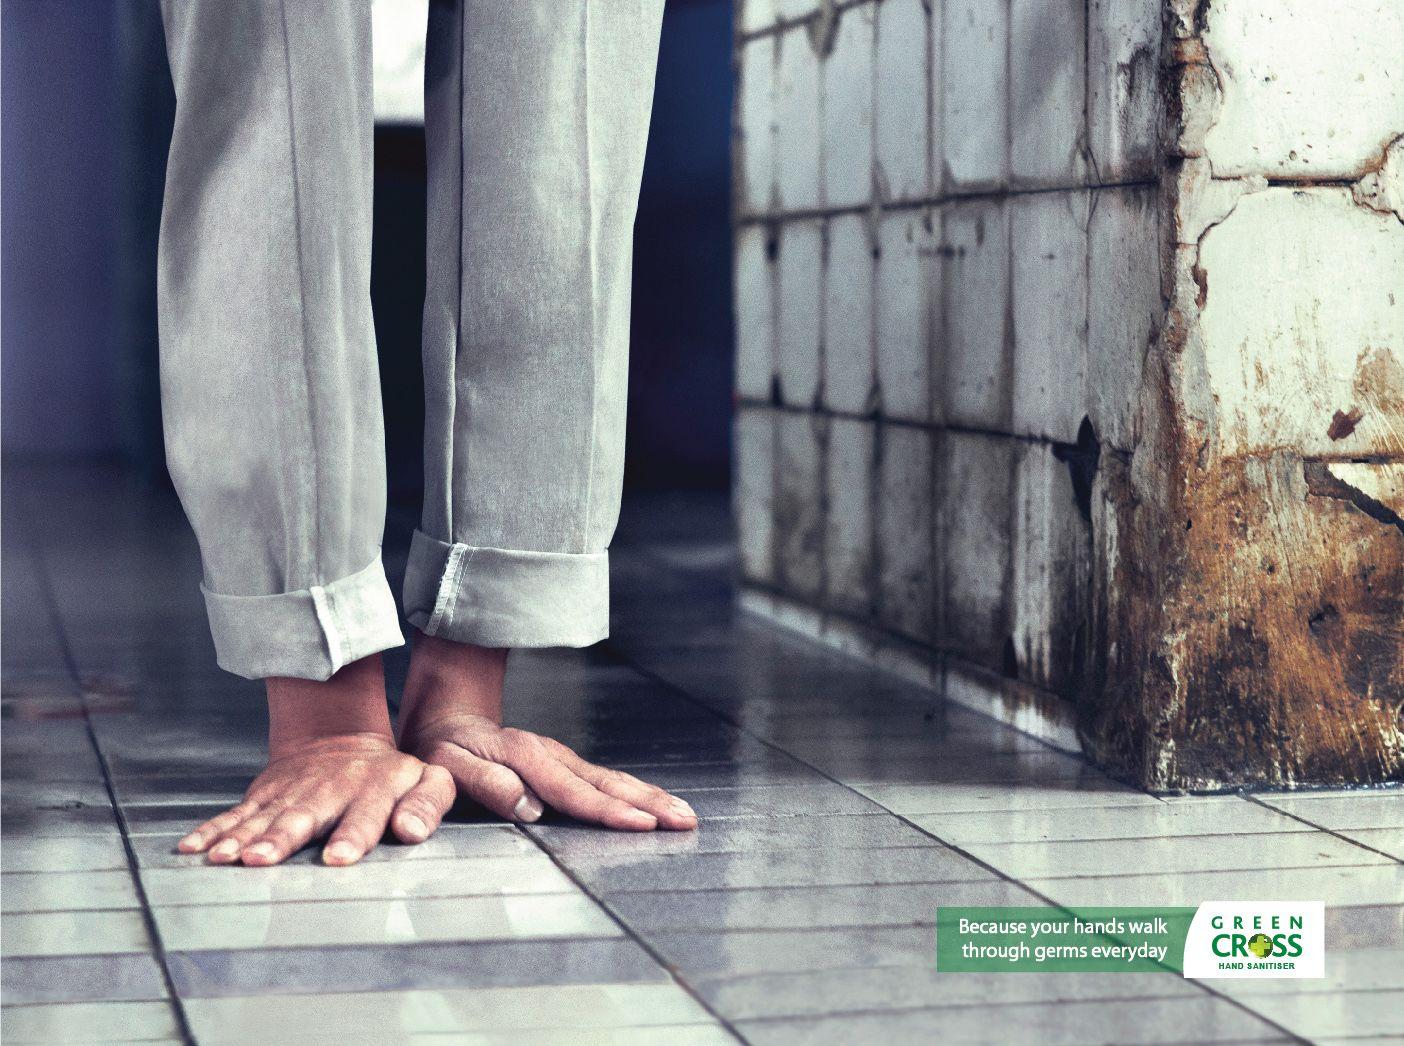 Green Cross Hand Sanitizer Toilet Cross Hands Advertising